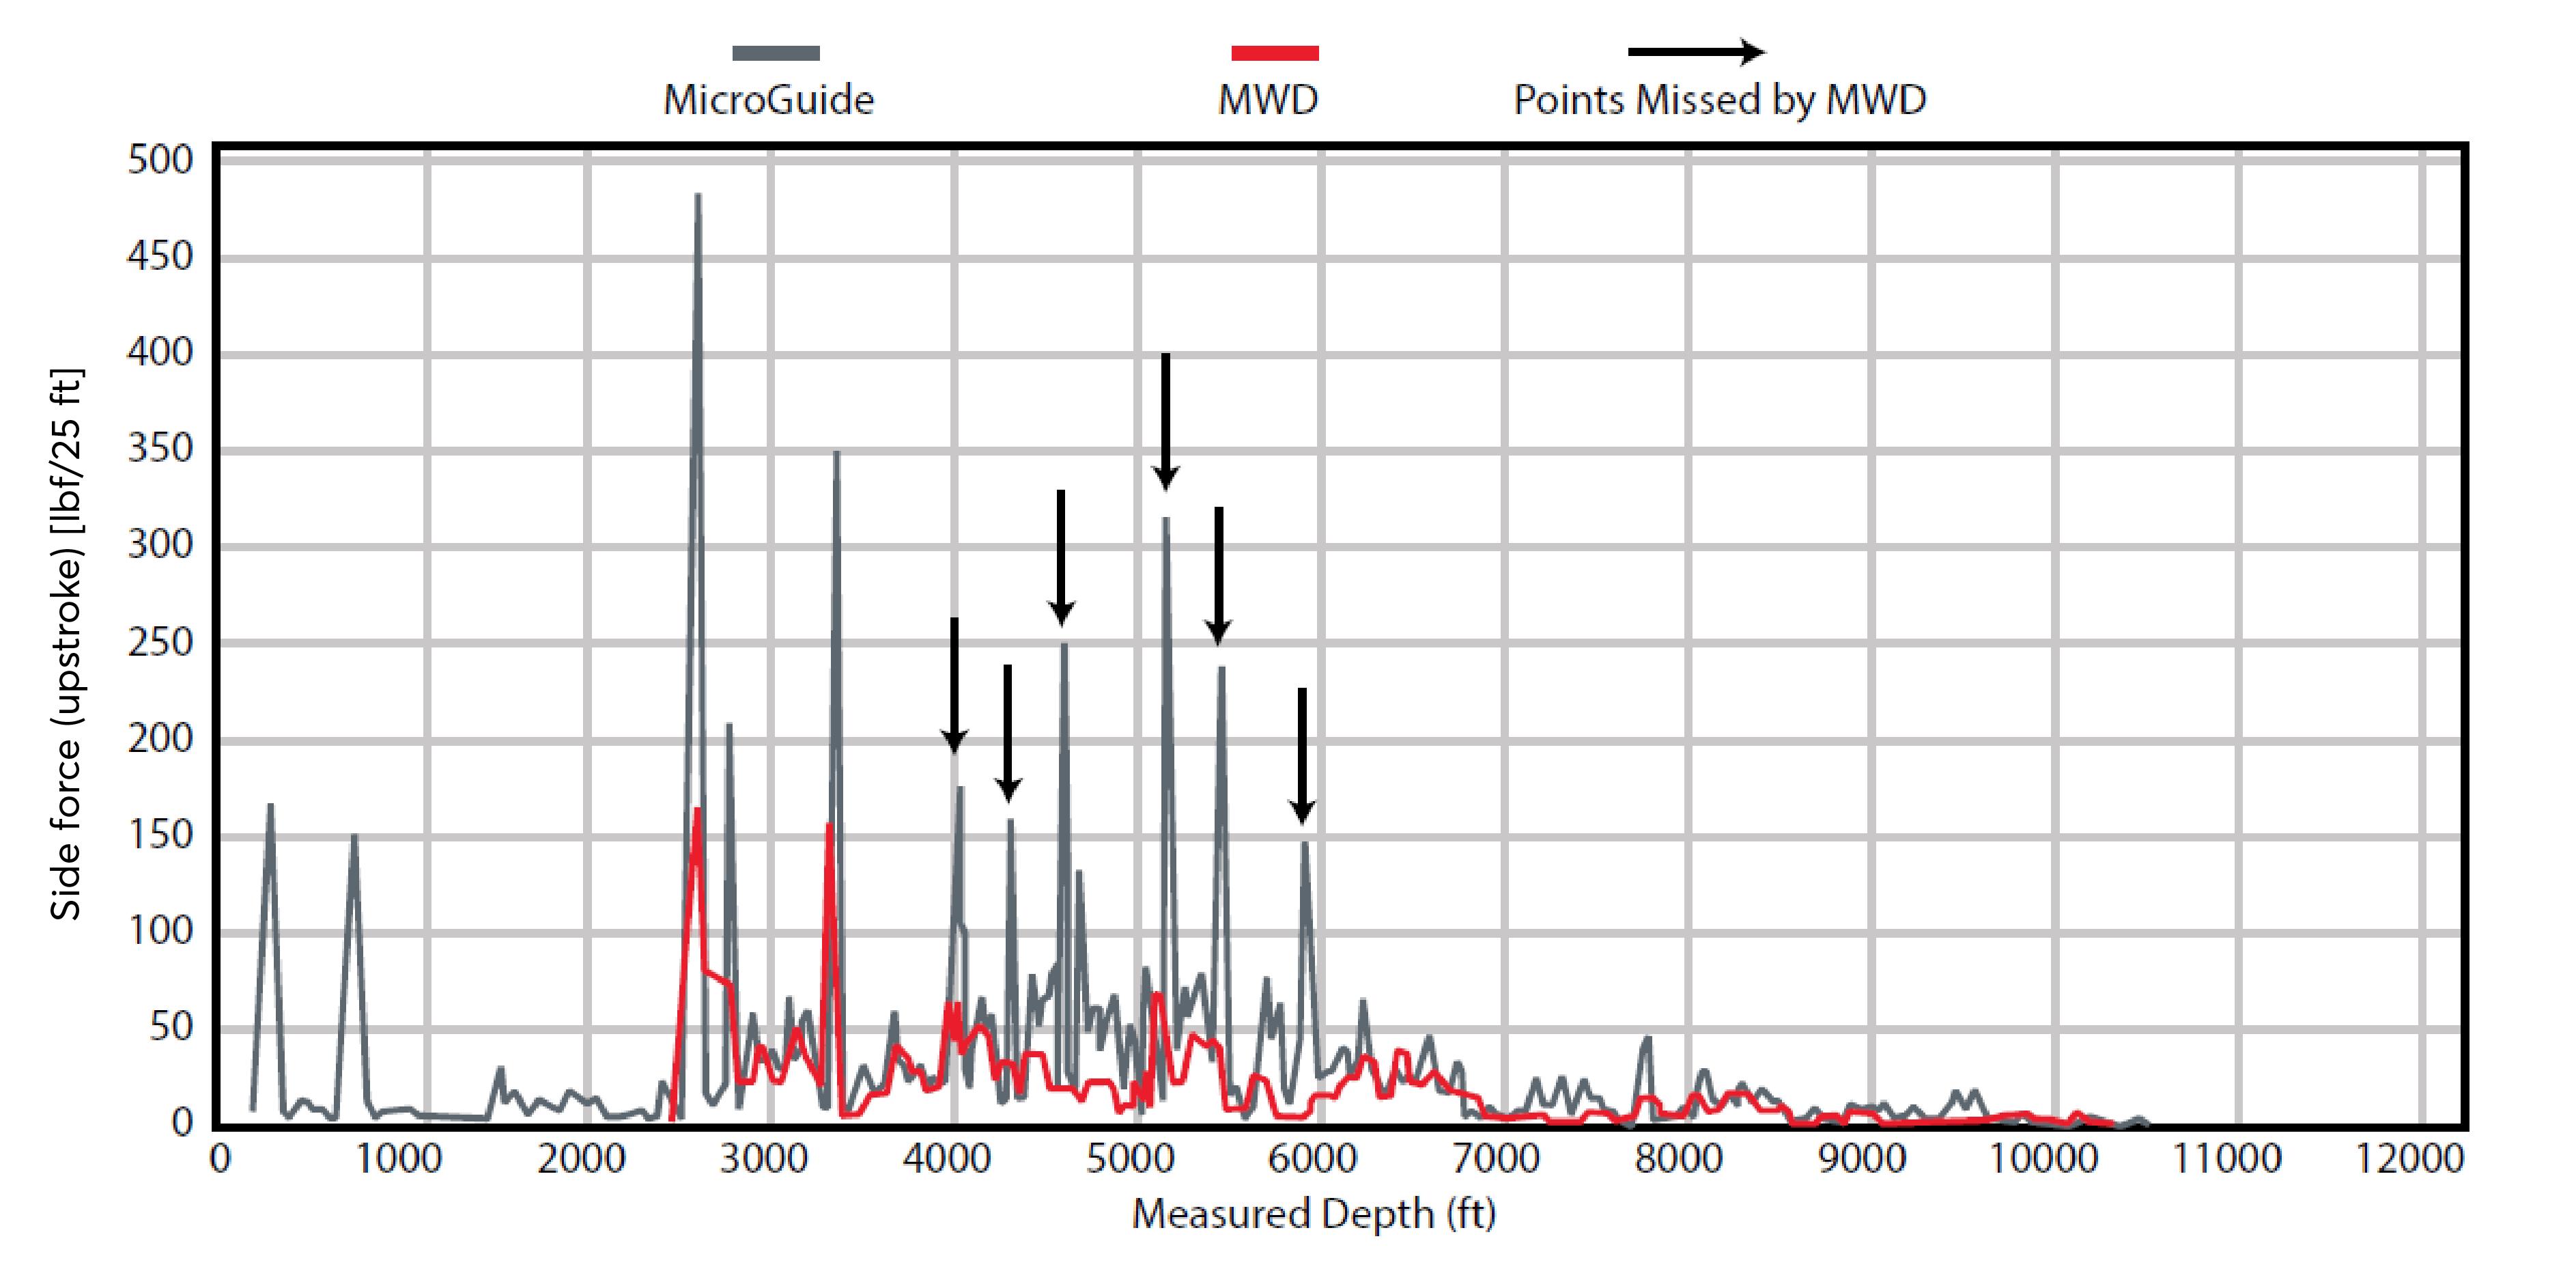 مطالعه موردی Gyrodata MicroGuide Wellbore در شیل Bakken شکل 2